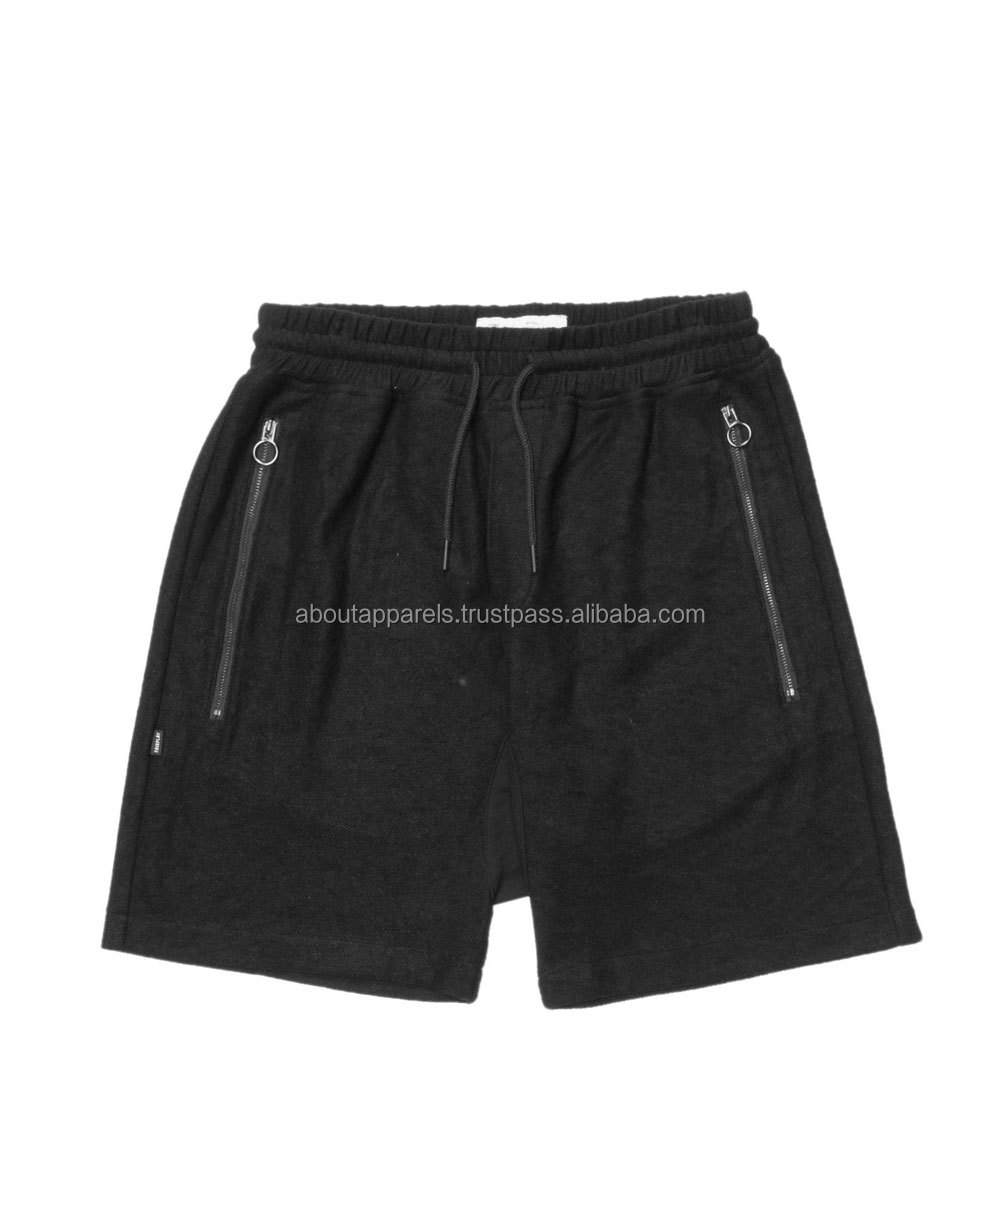 T Shirts Men Protective Padded Compression Sports Tank Top Pants Shorts